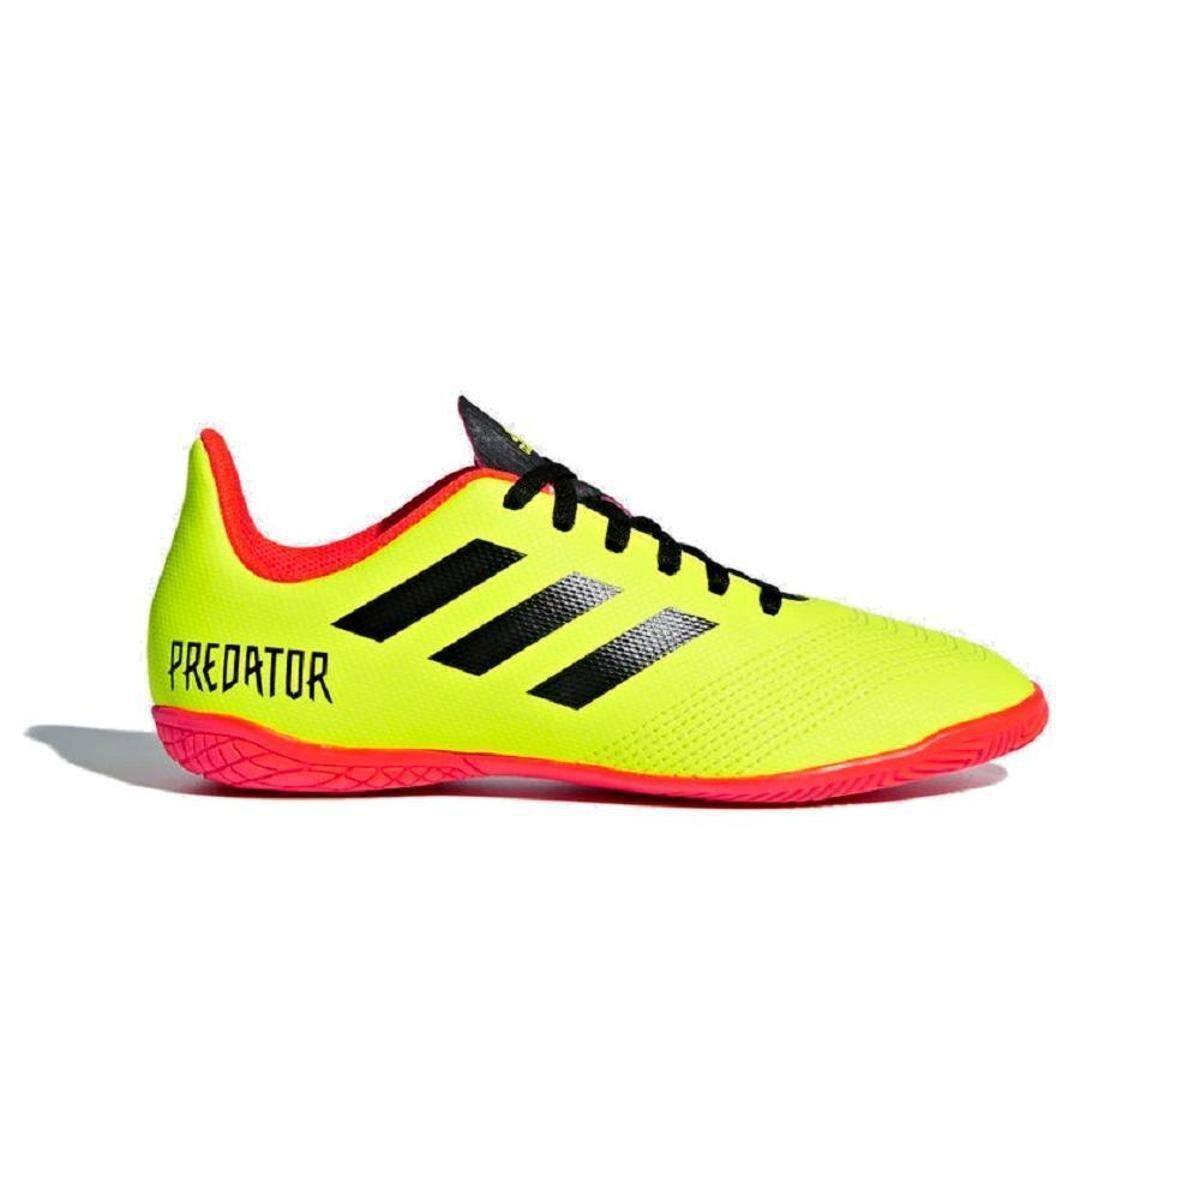 27c87f9cd1 Chuteira Futsal Infantil Adidas Predator 18 4 IN - Compre Agora ...